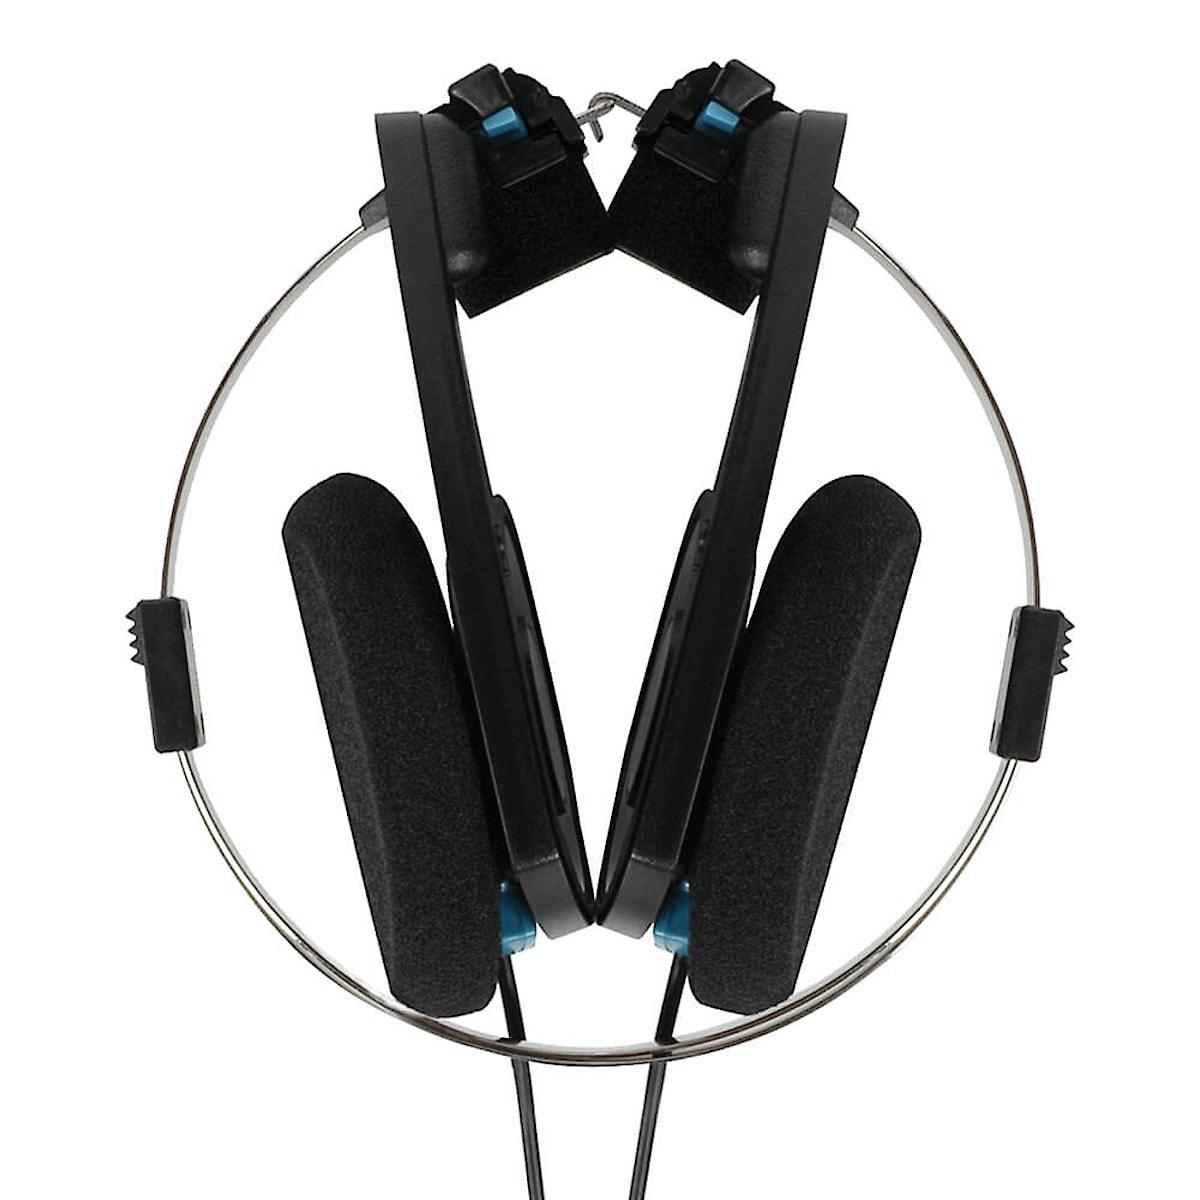 Trådlösa hörlurar, Koss Porta Pro Wireless